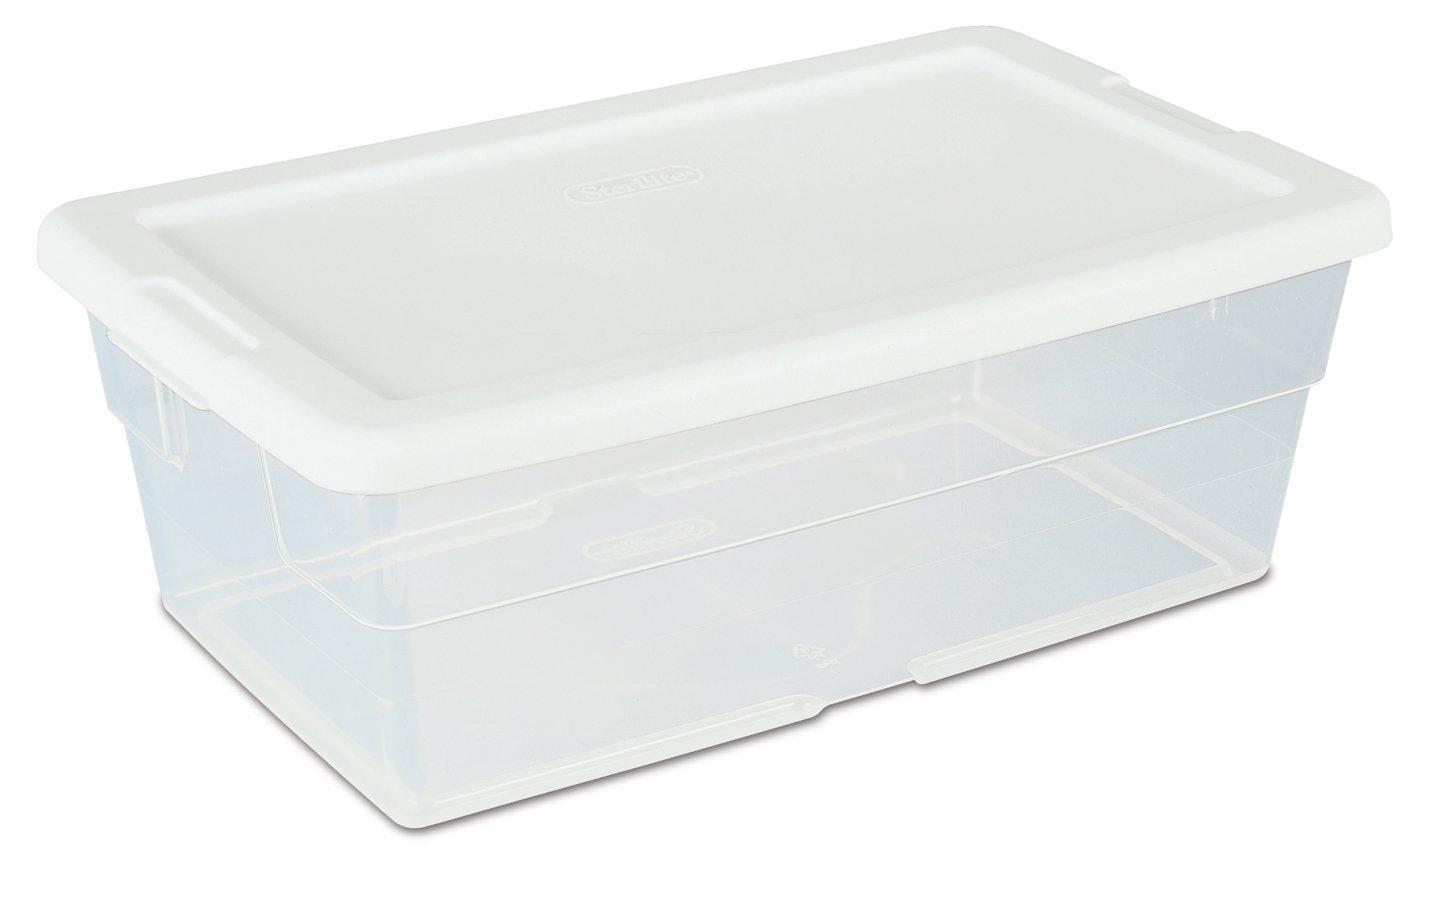 12 pack storage box plastic container bin organizer tote lids clear 6 quart ebay. Black Bedroom Furniture Sets. Home Design Ideas